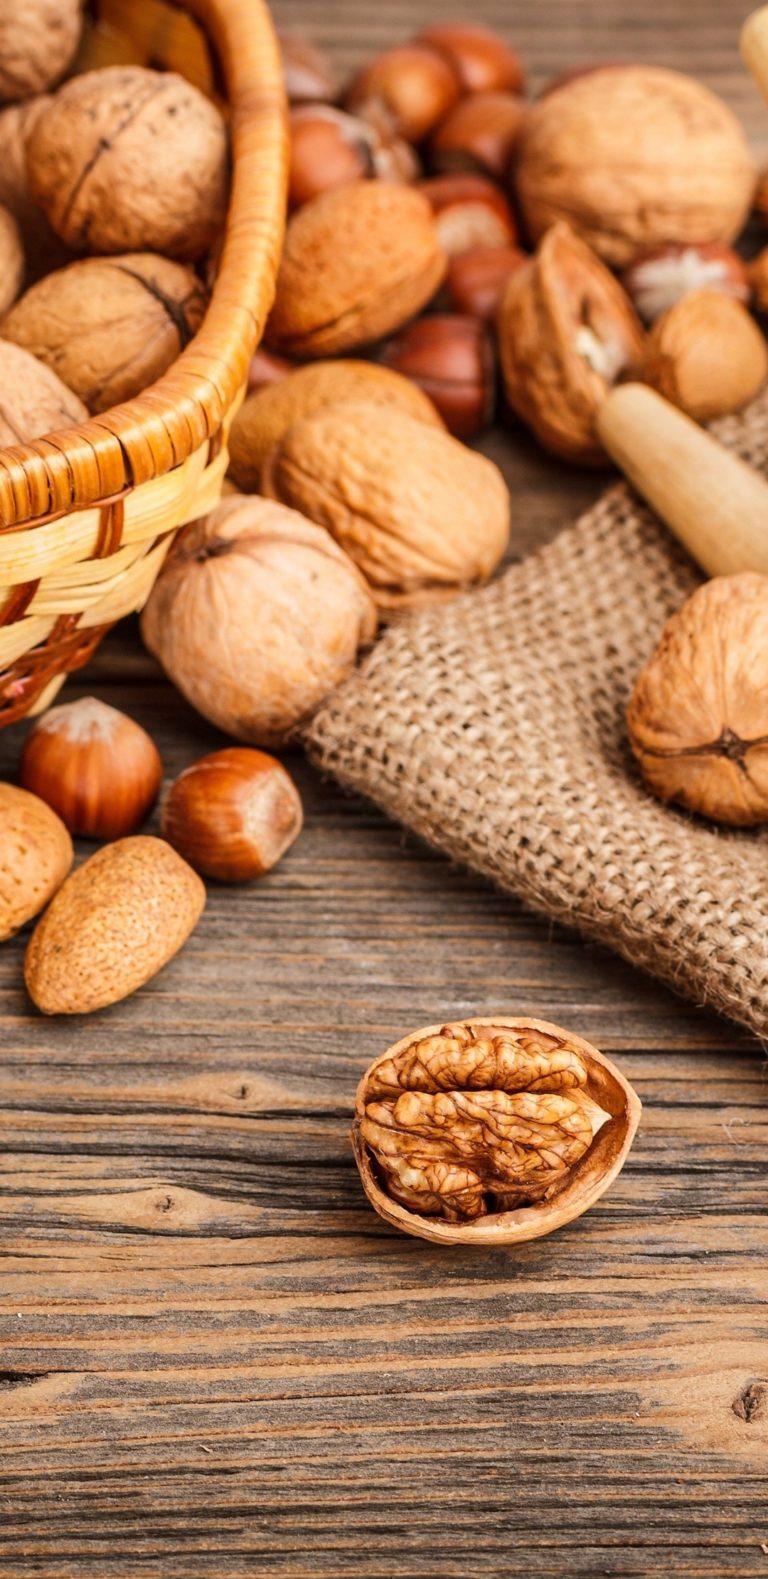 Almonds Hazelnuts Walnuts 1080x2220 768x1579